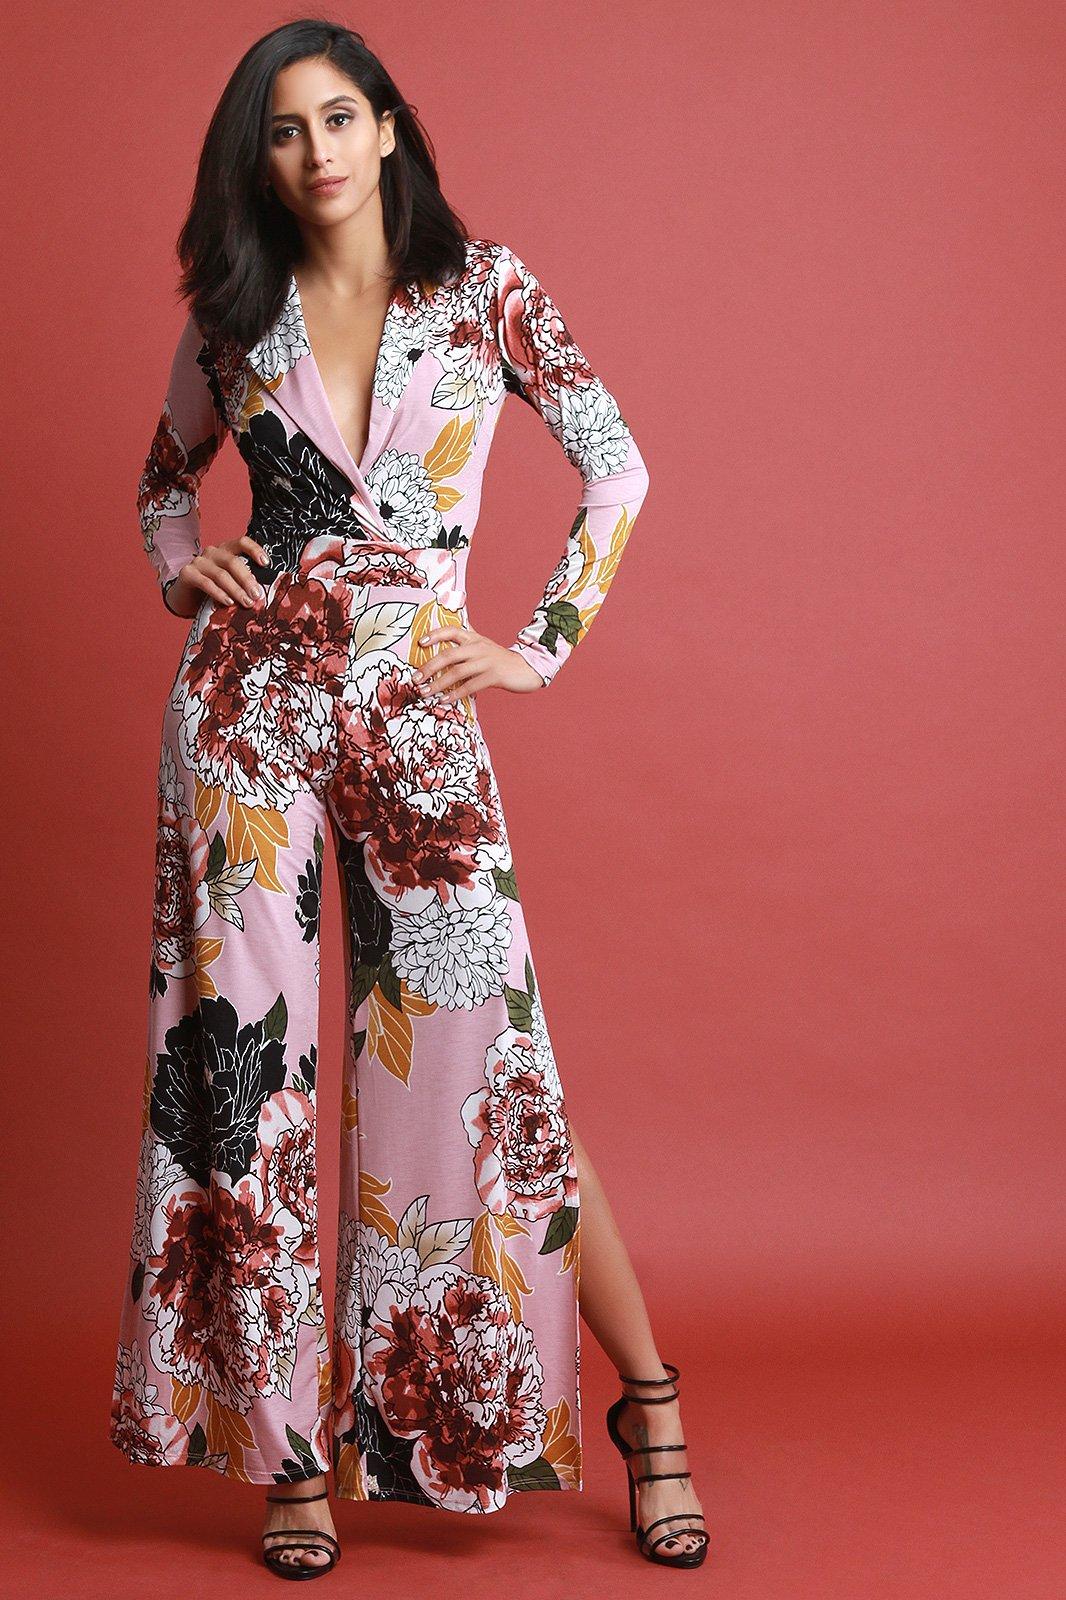 8c678e7b2da1 Peony Side Slit Jumpsuit  stylishoutfit  casualdress